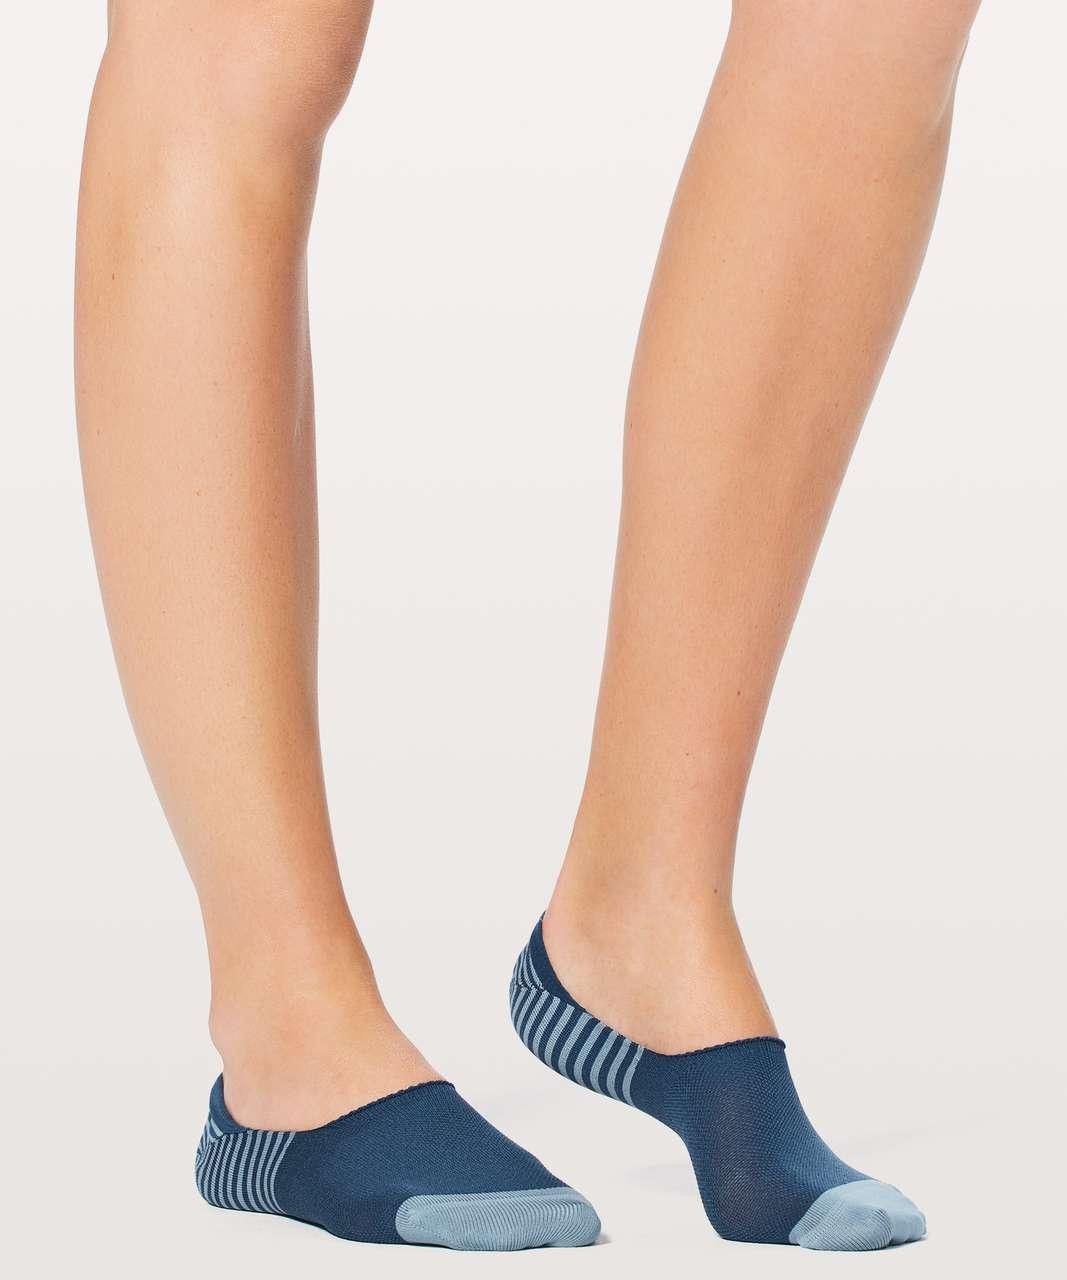 Lululemon Secret Sock - Magnetic Blue / Seascape / Persian Blue